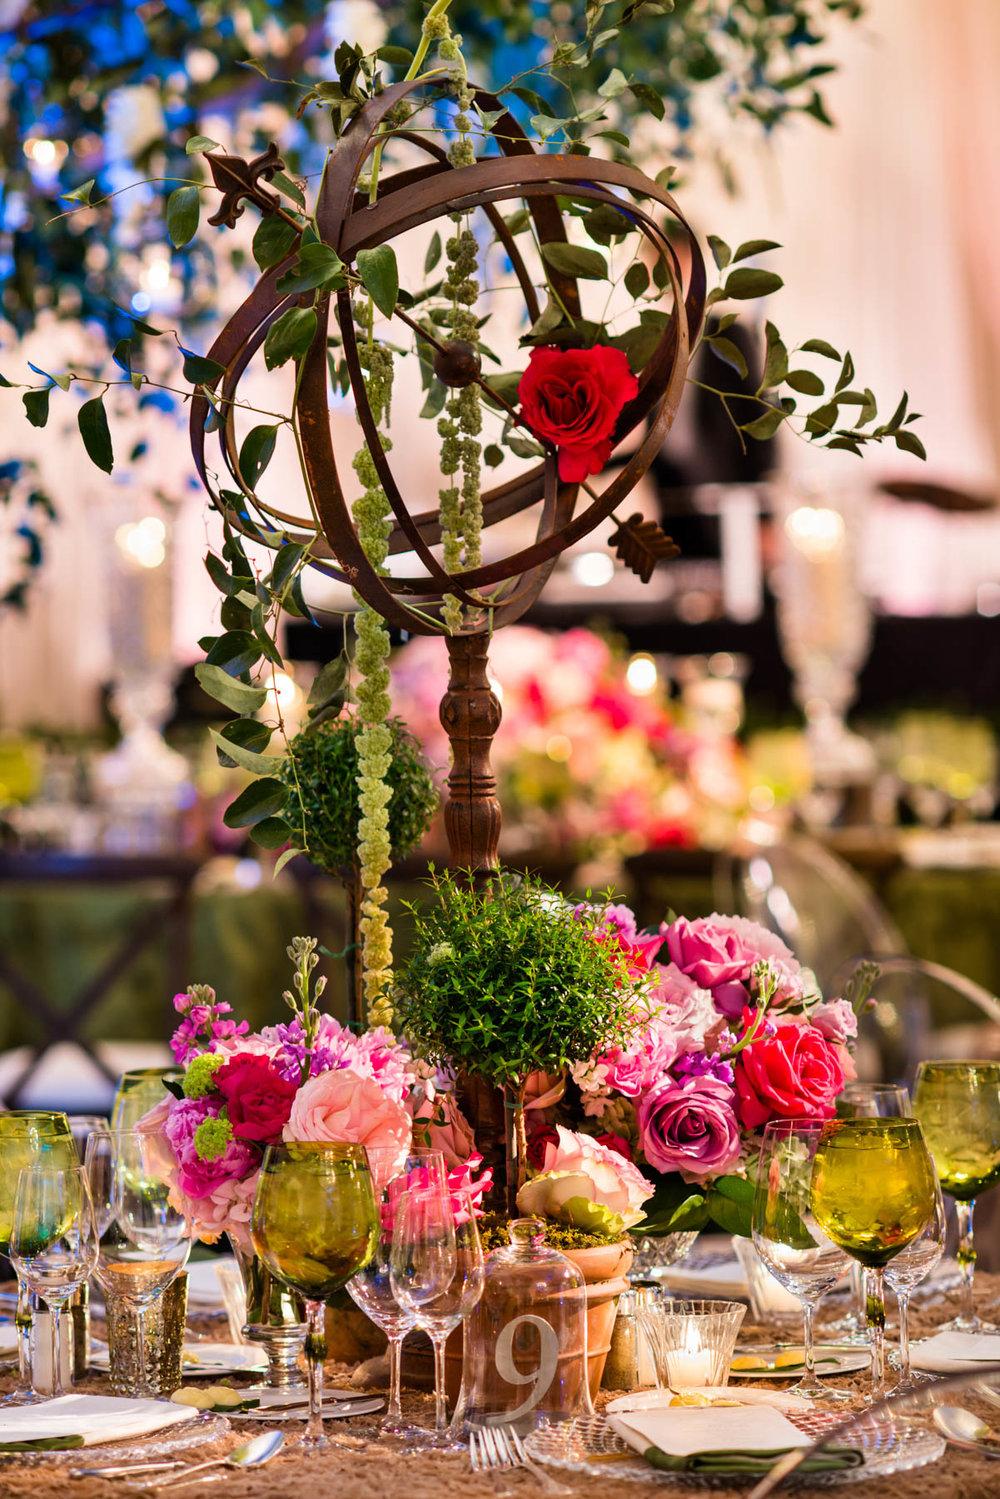 birch-bespoke-events-and-weddings-8.jpg